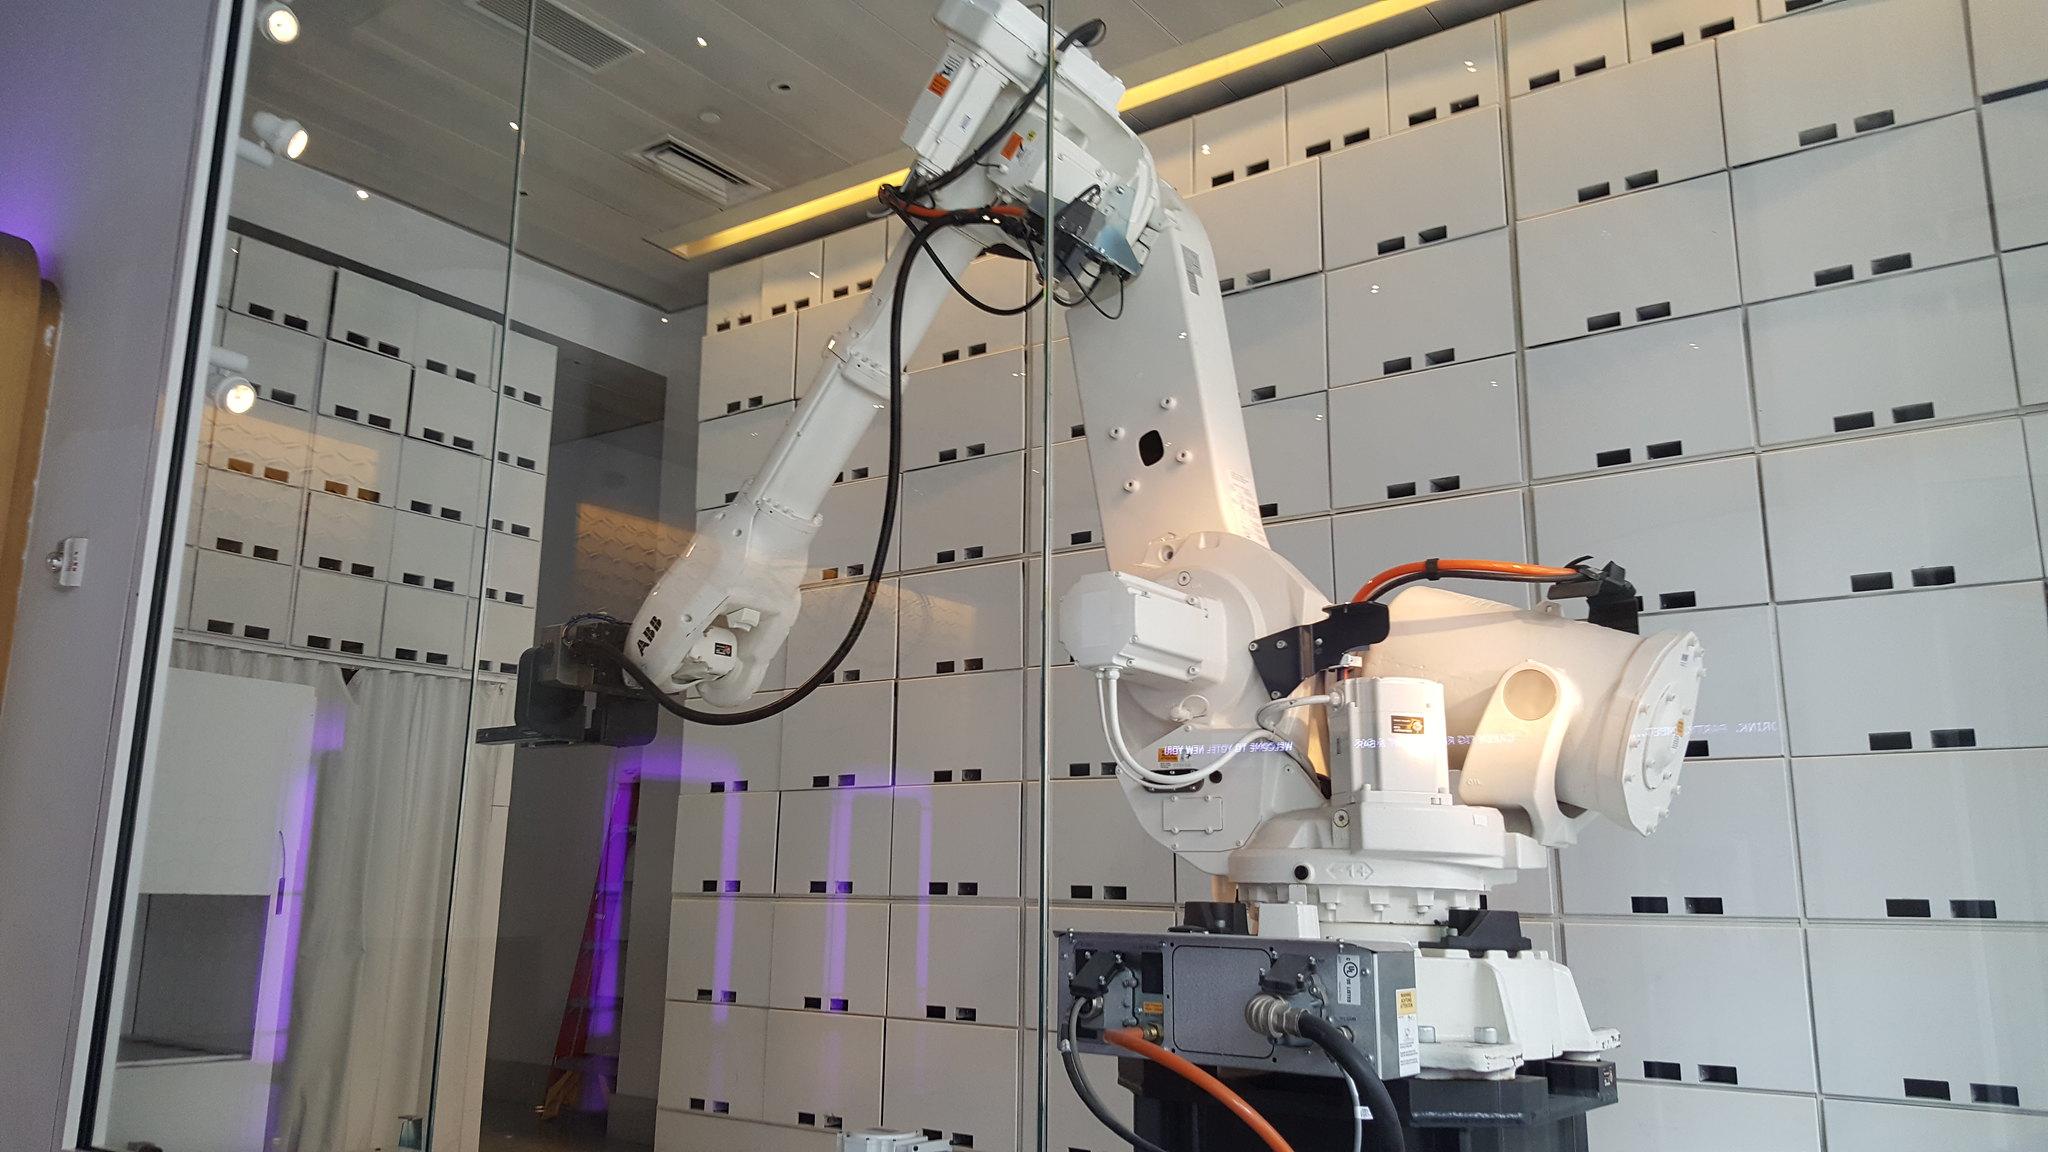 Yotel Robot